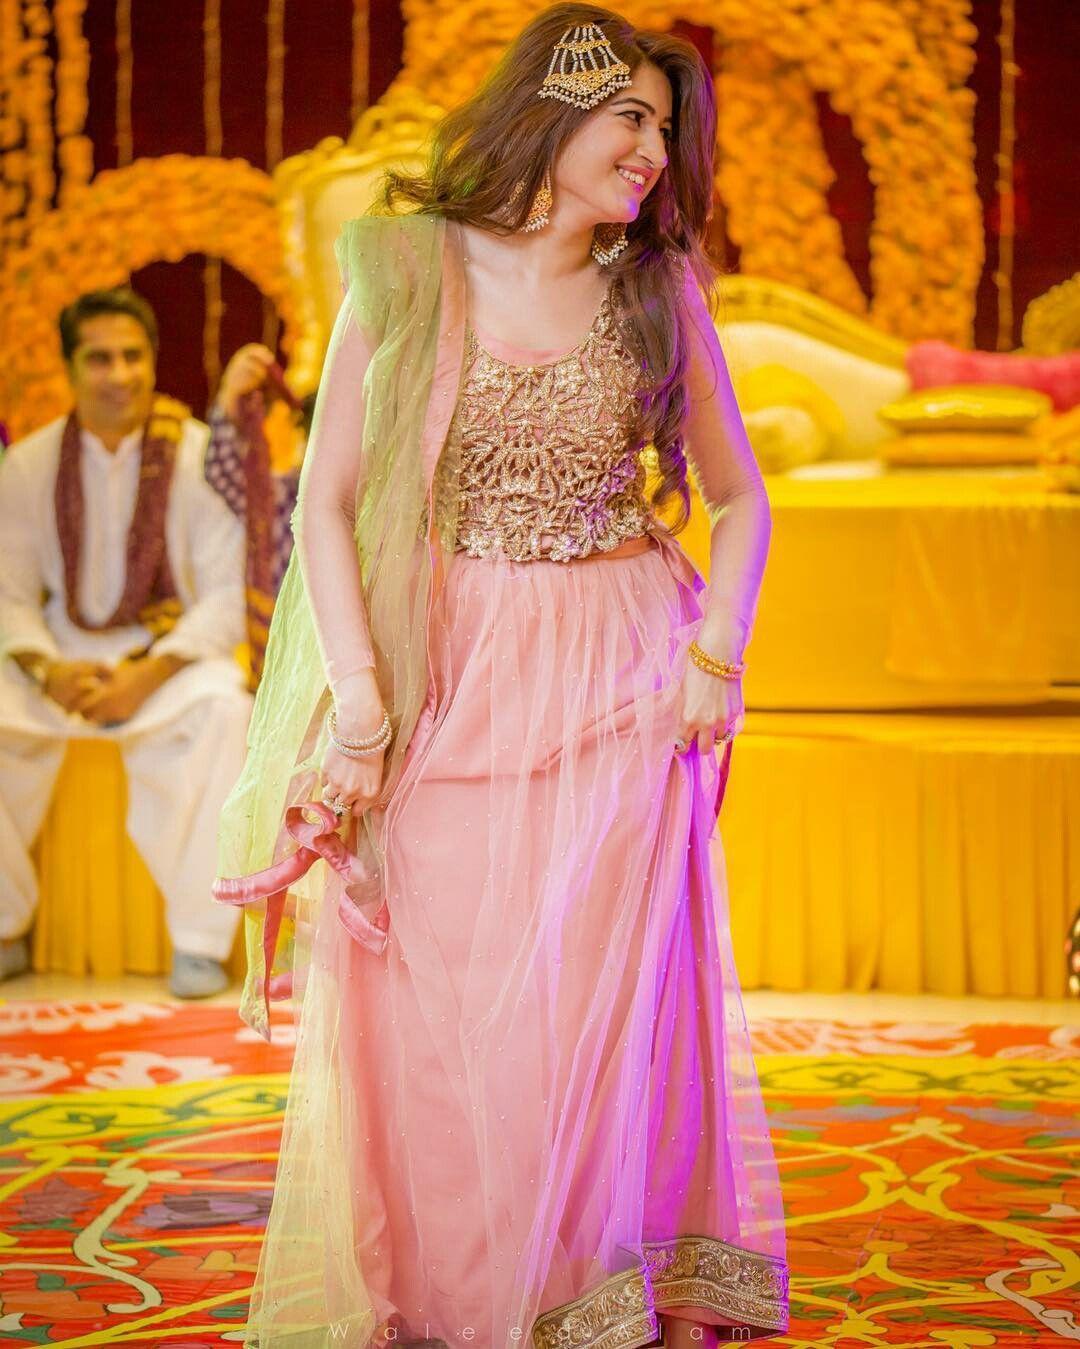 Pin de Farheen Raja en Pakistan wedding | Pinterest